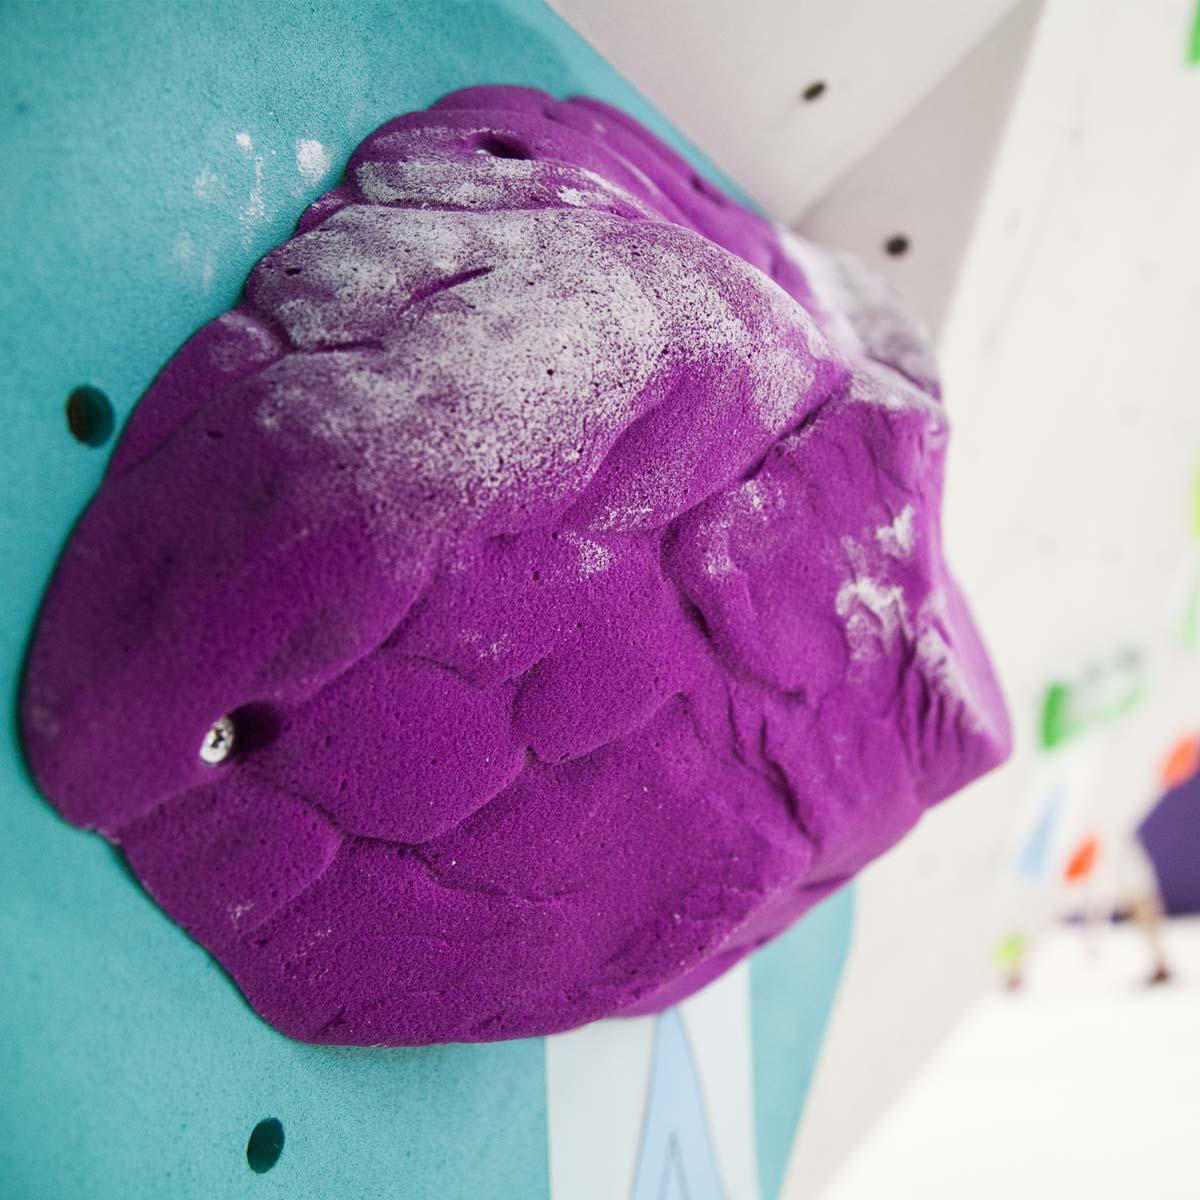 FLASHH_boulder_spot_Boulderkurse